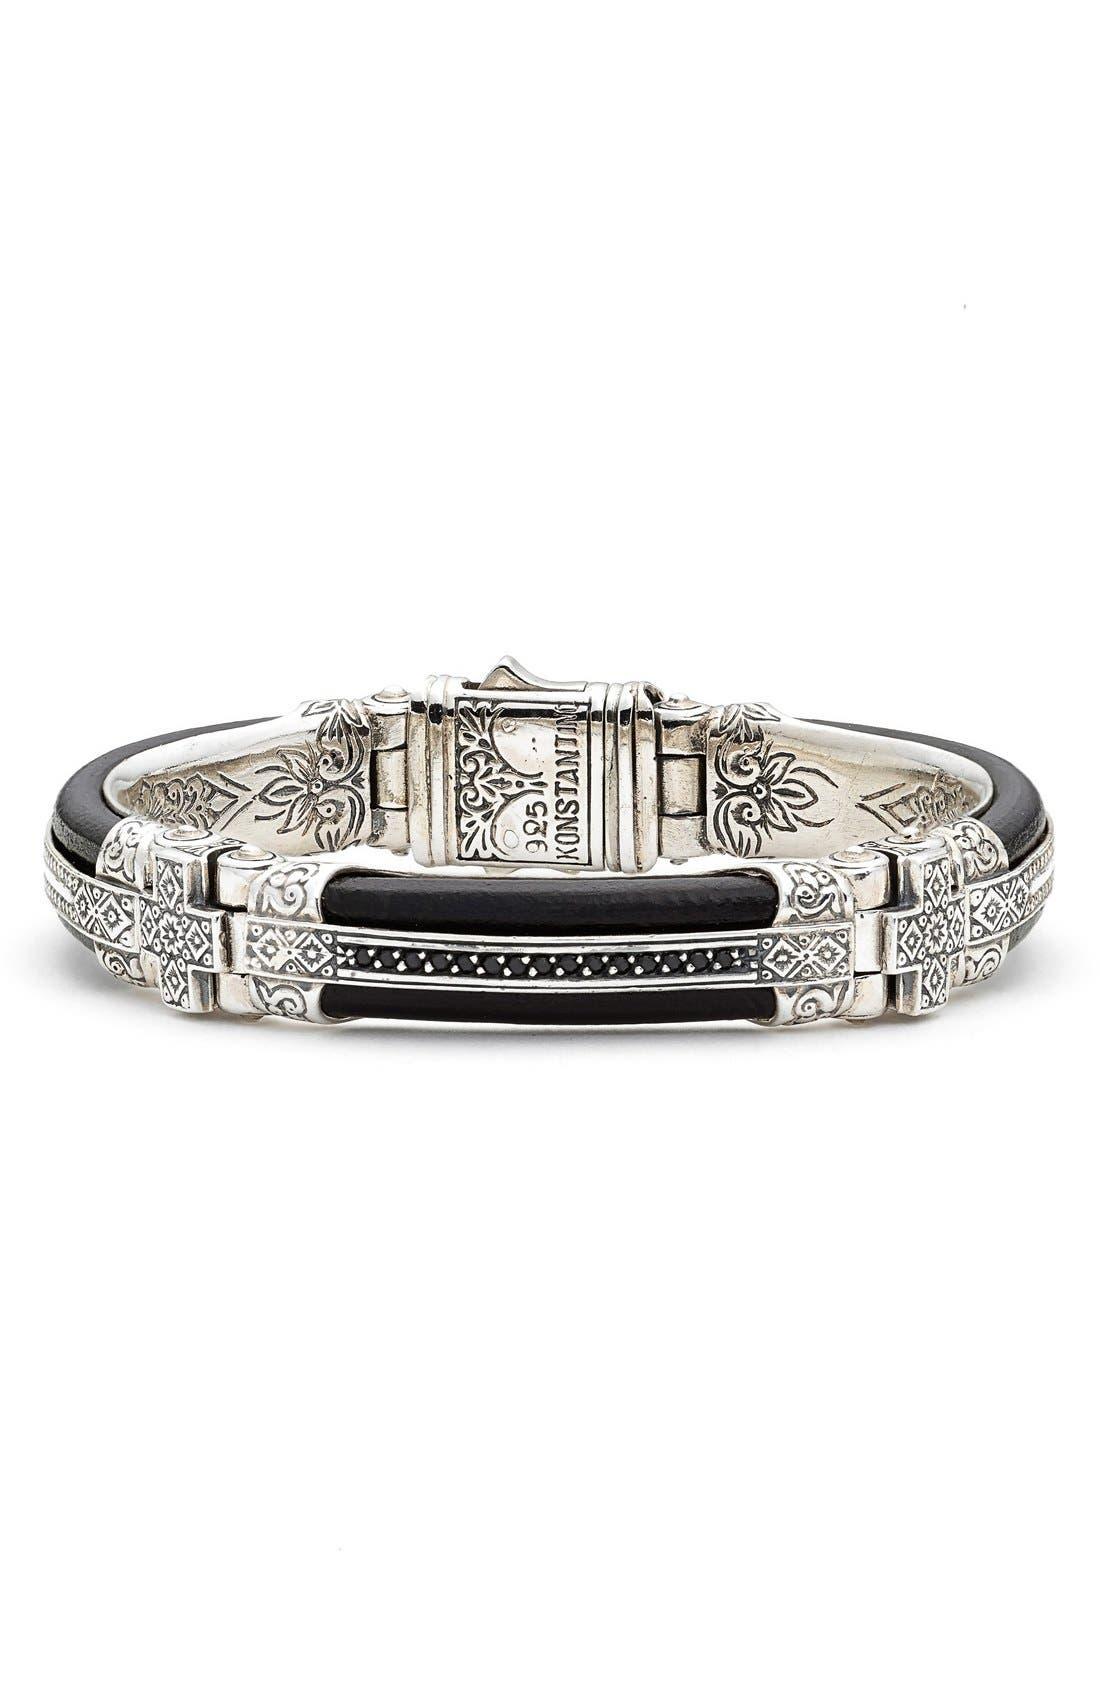 Plato Etched Sterling Silver & Leather Bracelet,                         Main,                         color, 040